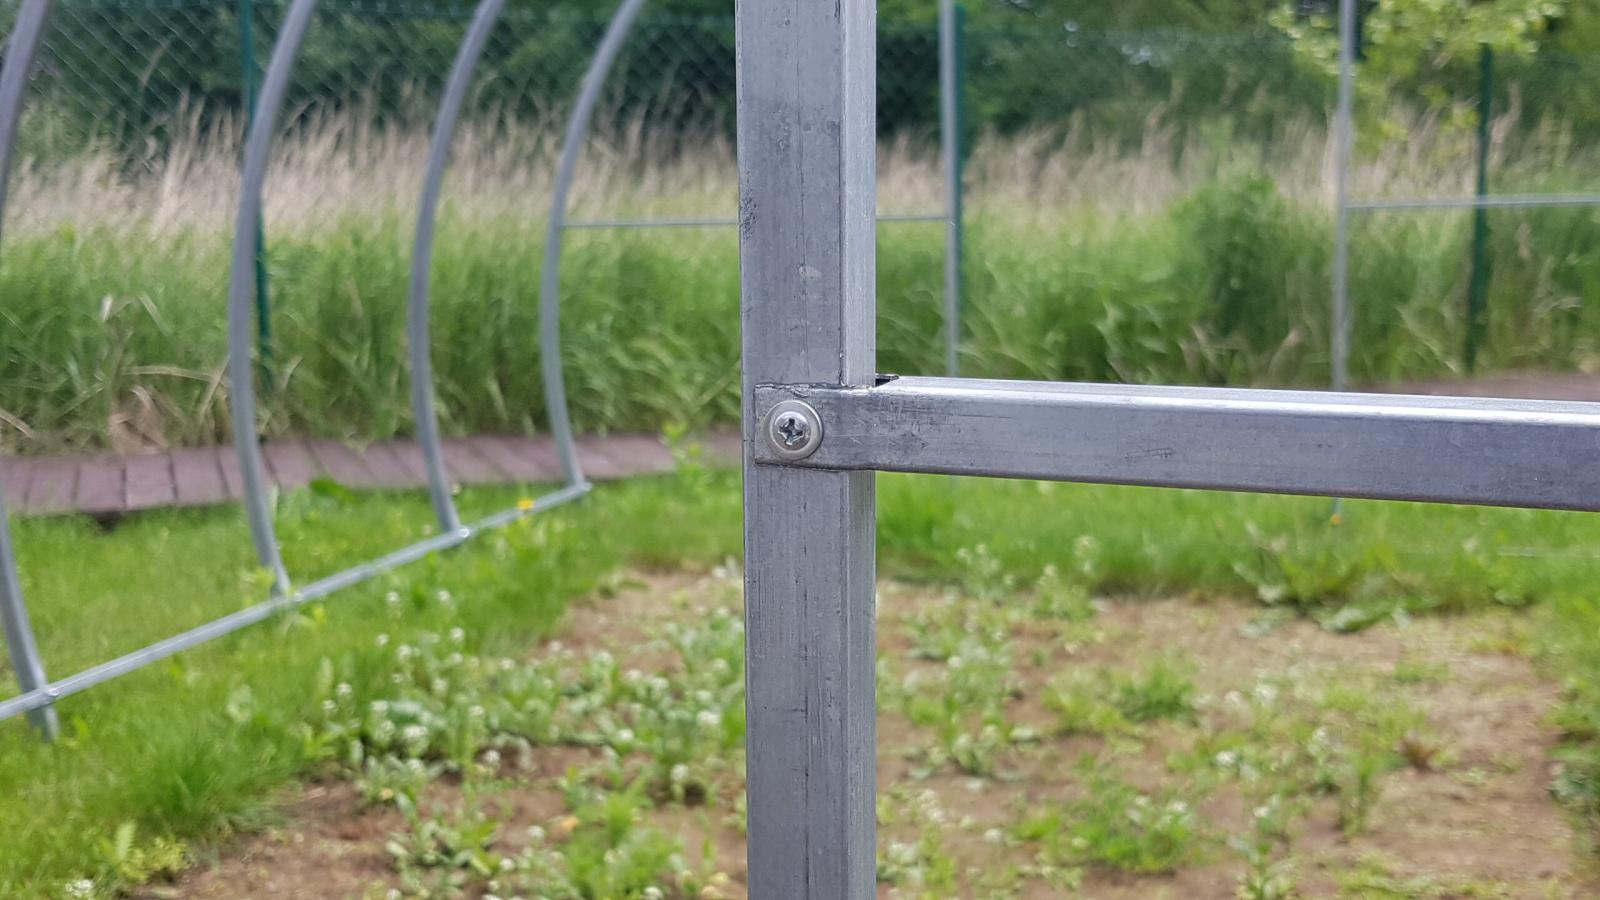 skleník LANITPLAST DNĚPR 3,14x10 m PC 4 mm